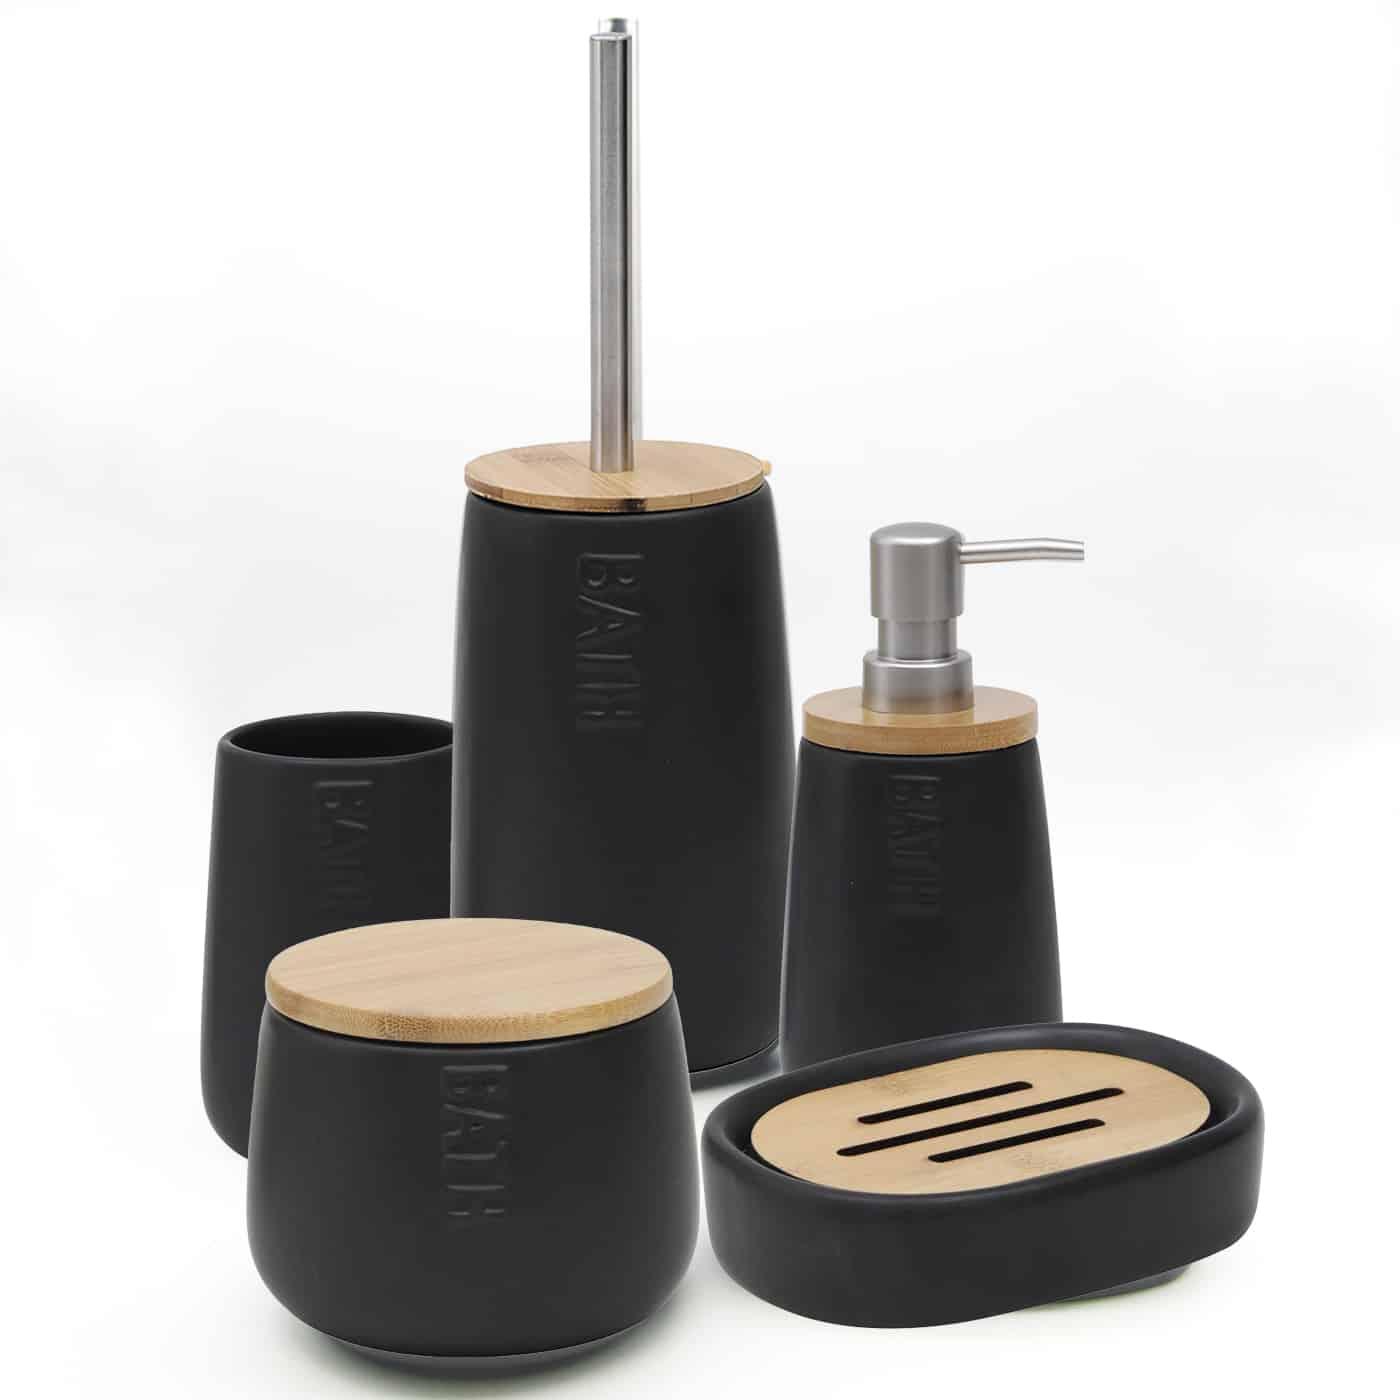 Bath D Dolomite Soap Dish Holder Black-Bamboo Top-Shower-Sink-Bathroom